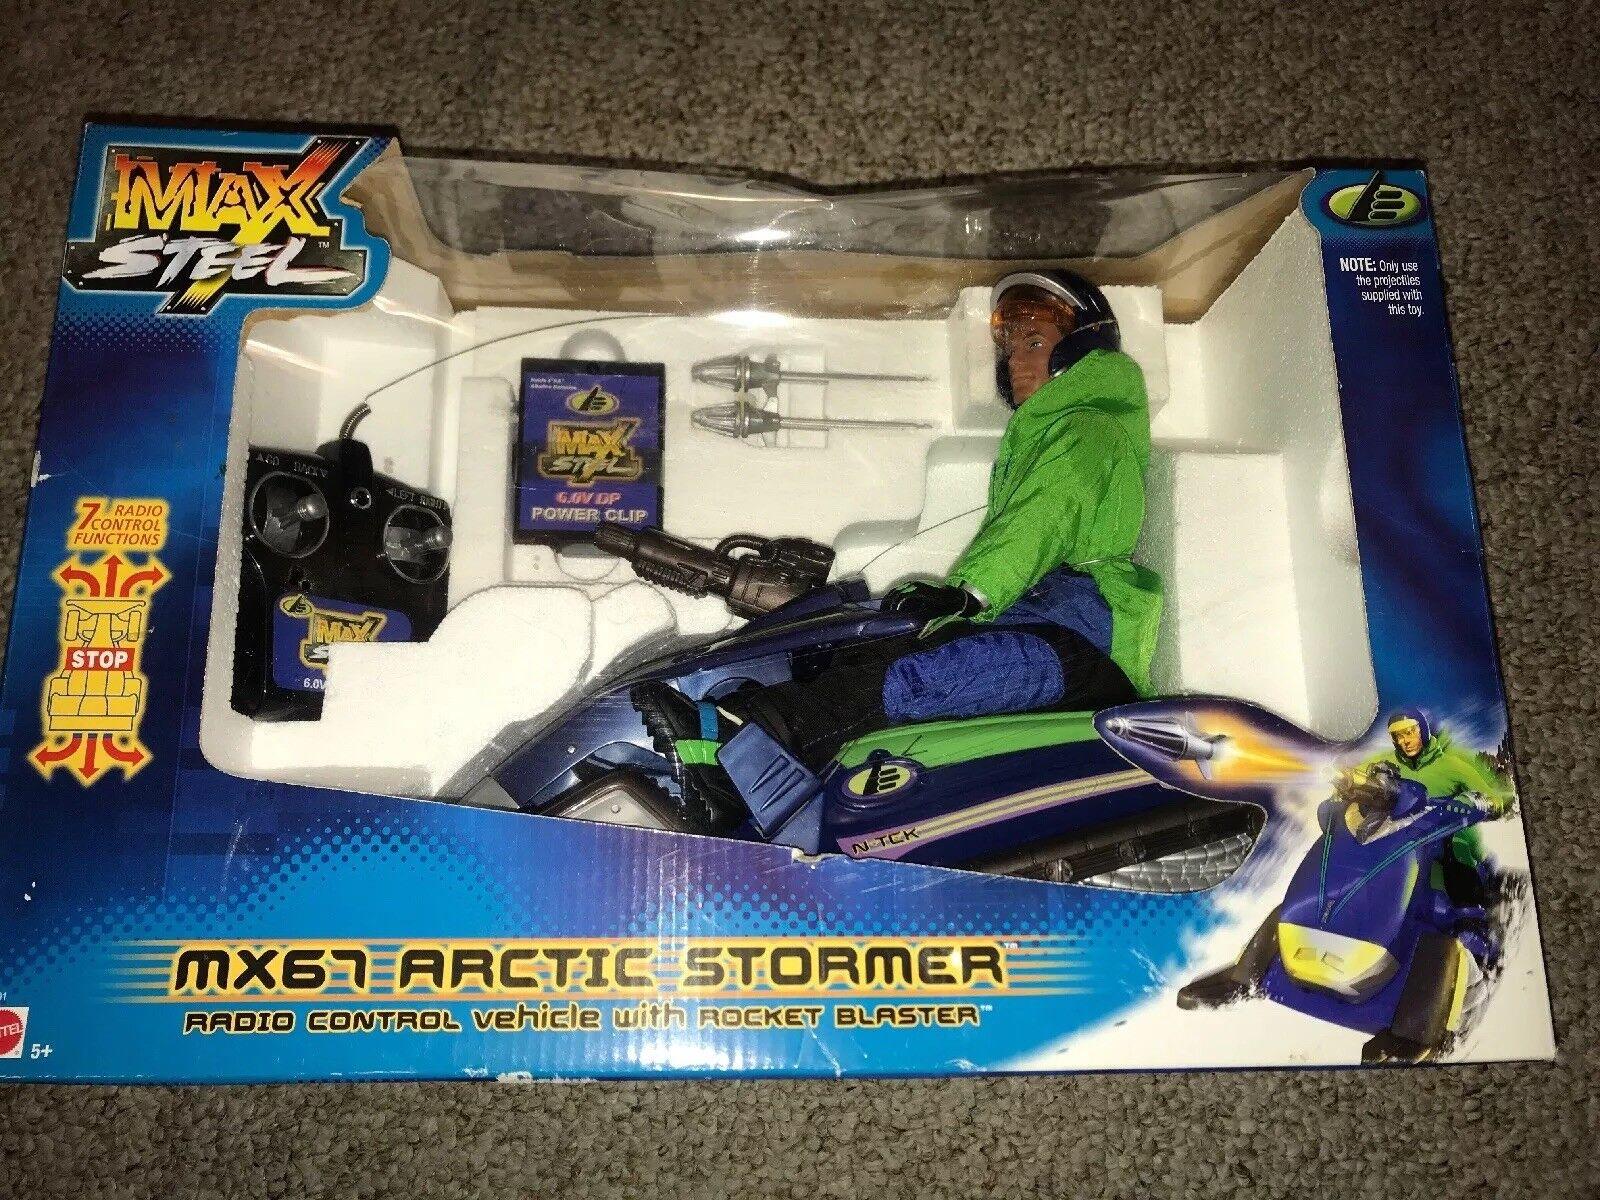 2008 Max Steel Tyco R C MX67 Arctic Stormer Radio Control 1 6 Vehicle & Figure